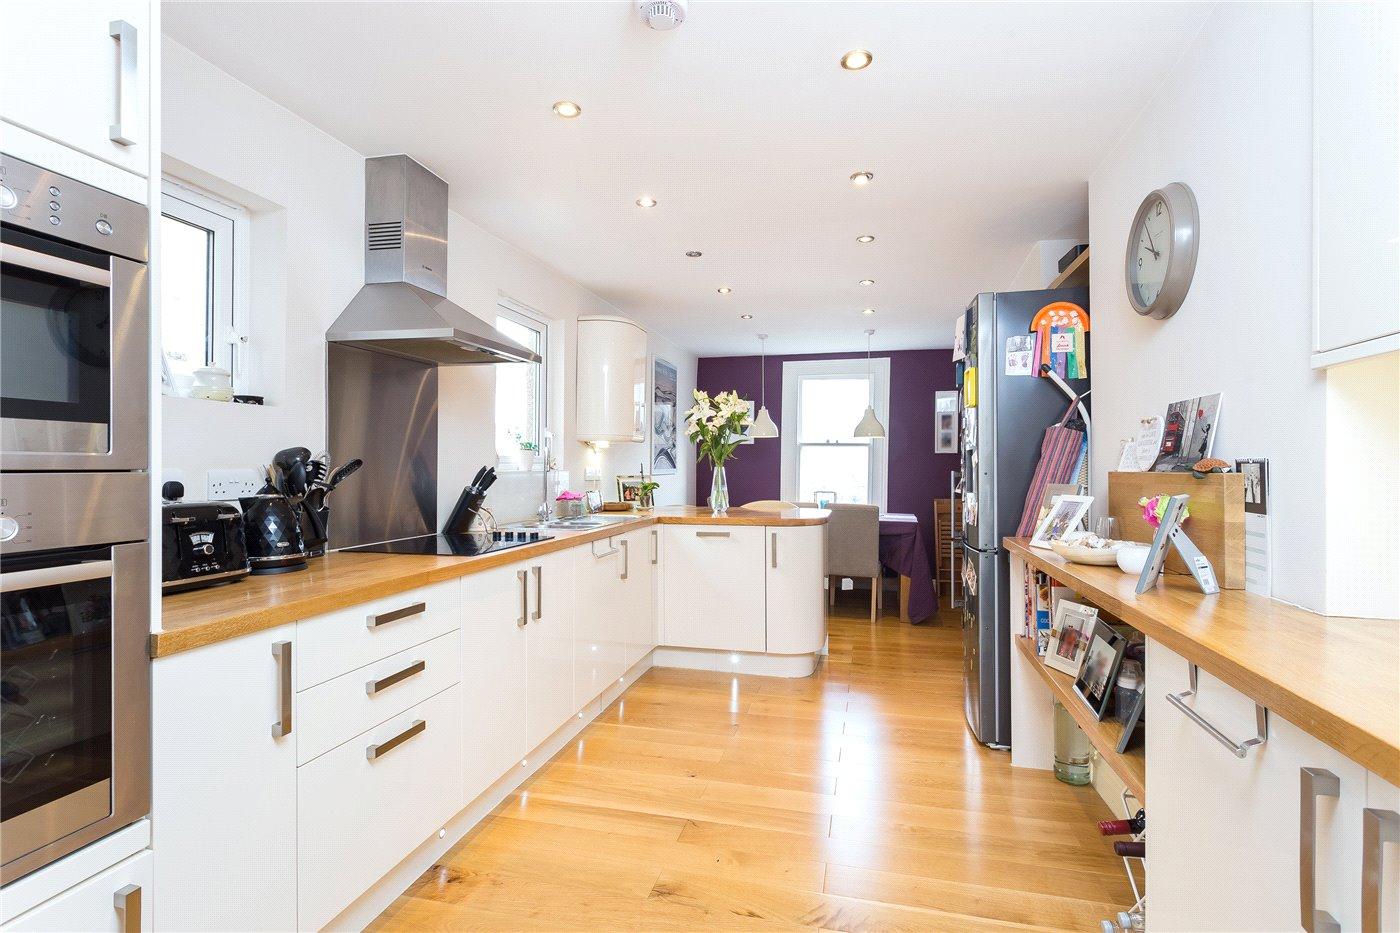 3 Bedroom Property For Sale In Whiteley Road London Se19